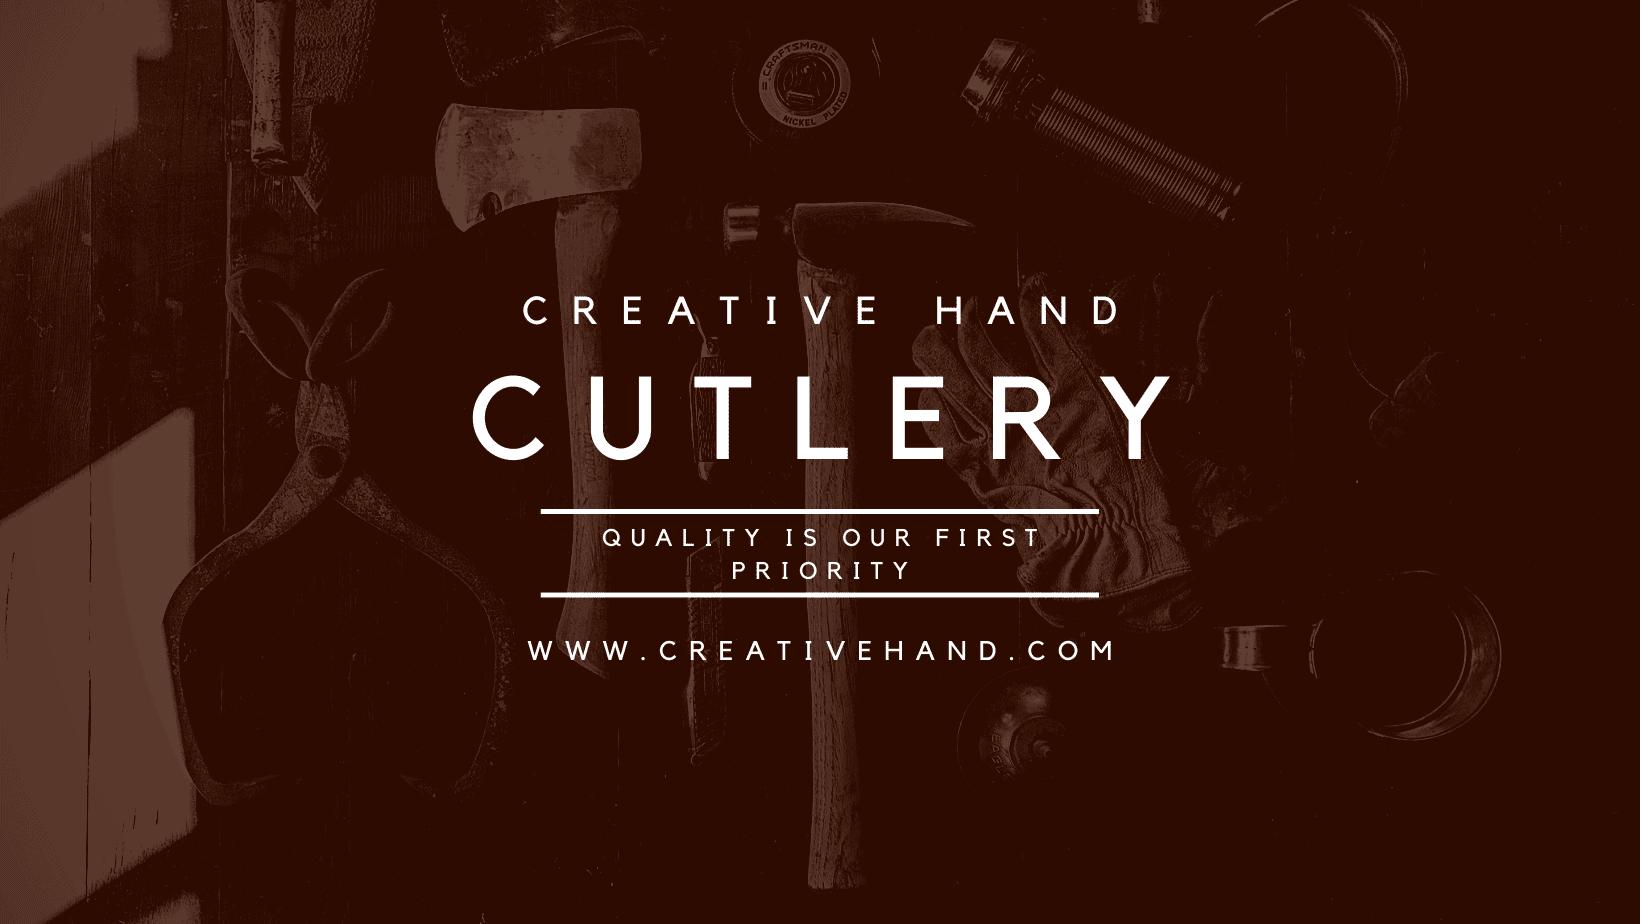 Creative Hands Cutlery shop